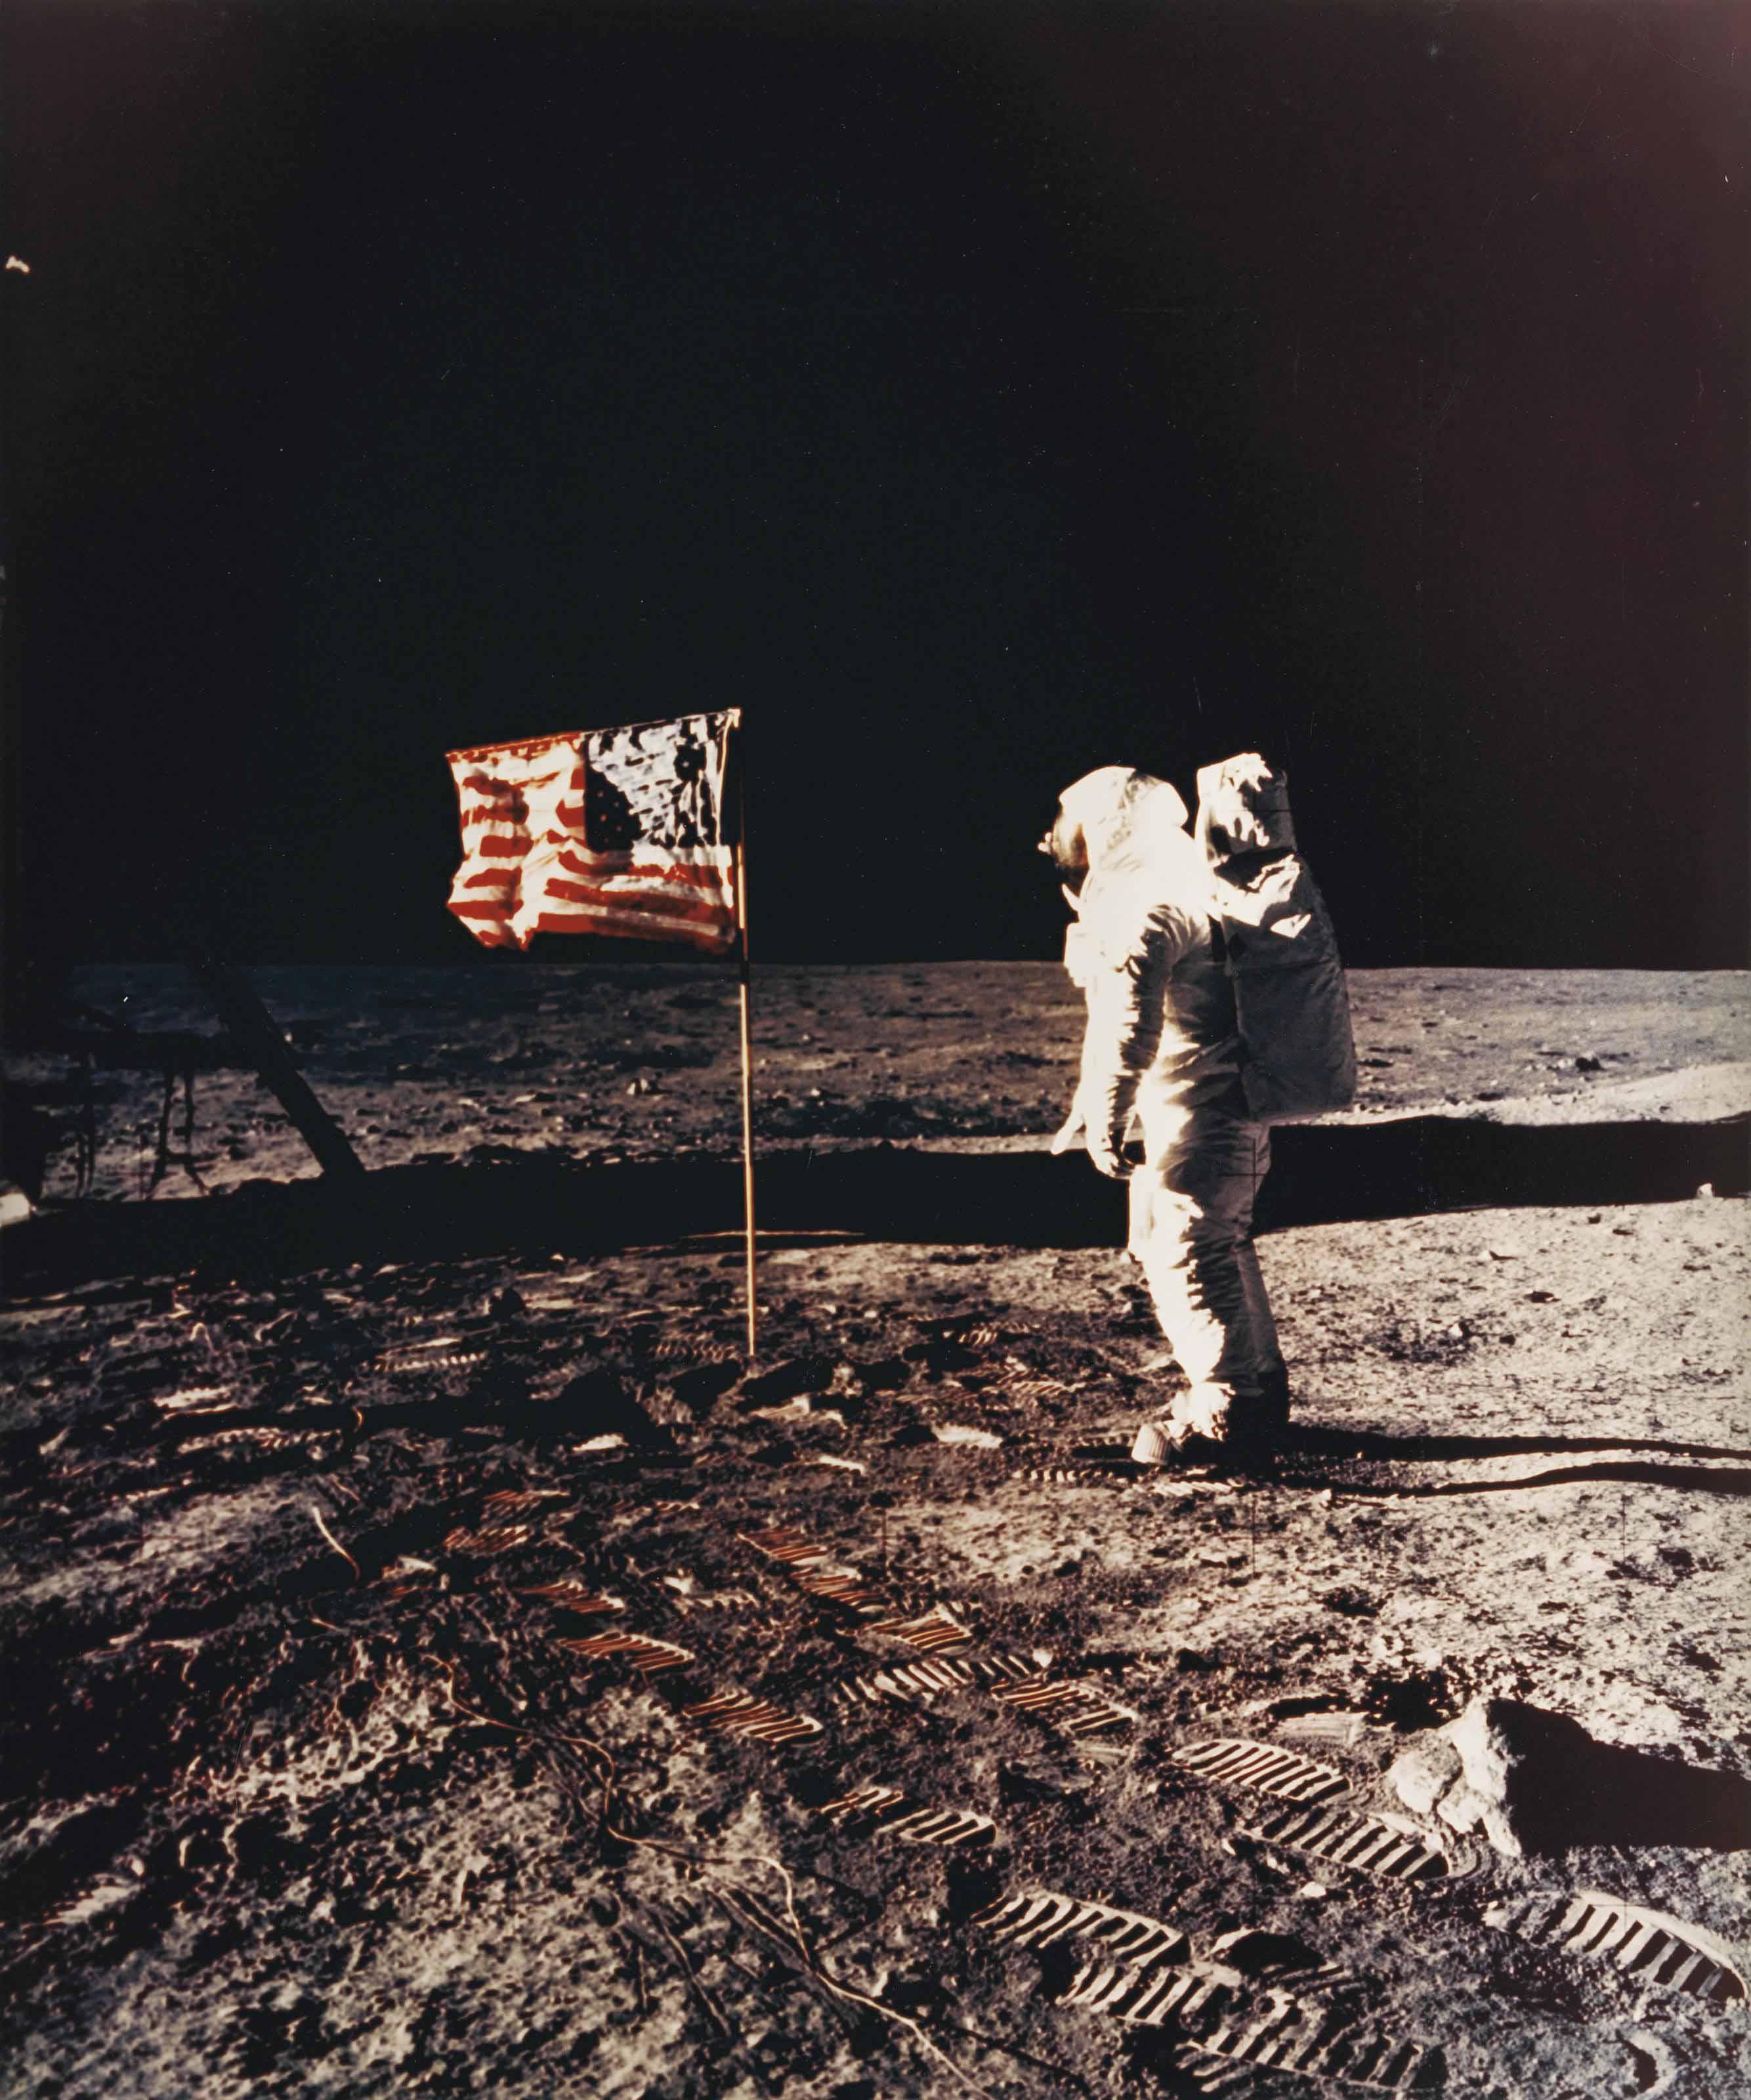 NEIL ARMSTRONG (1930-2012) for NASA